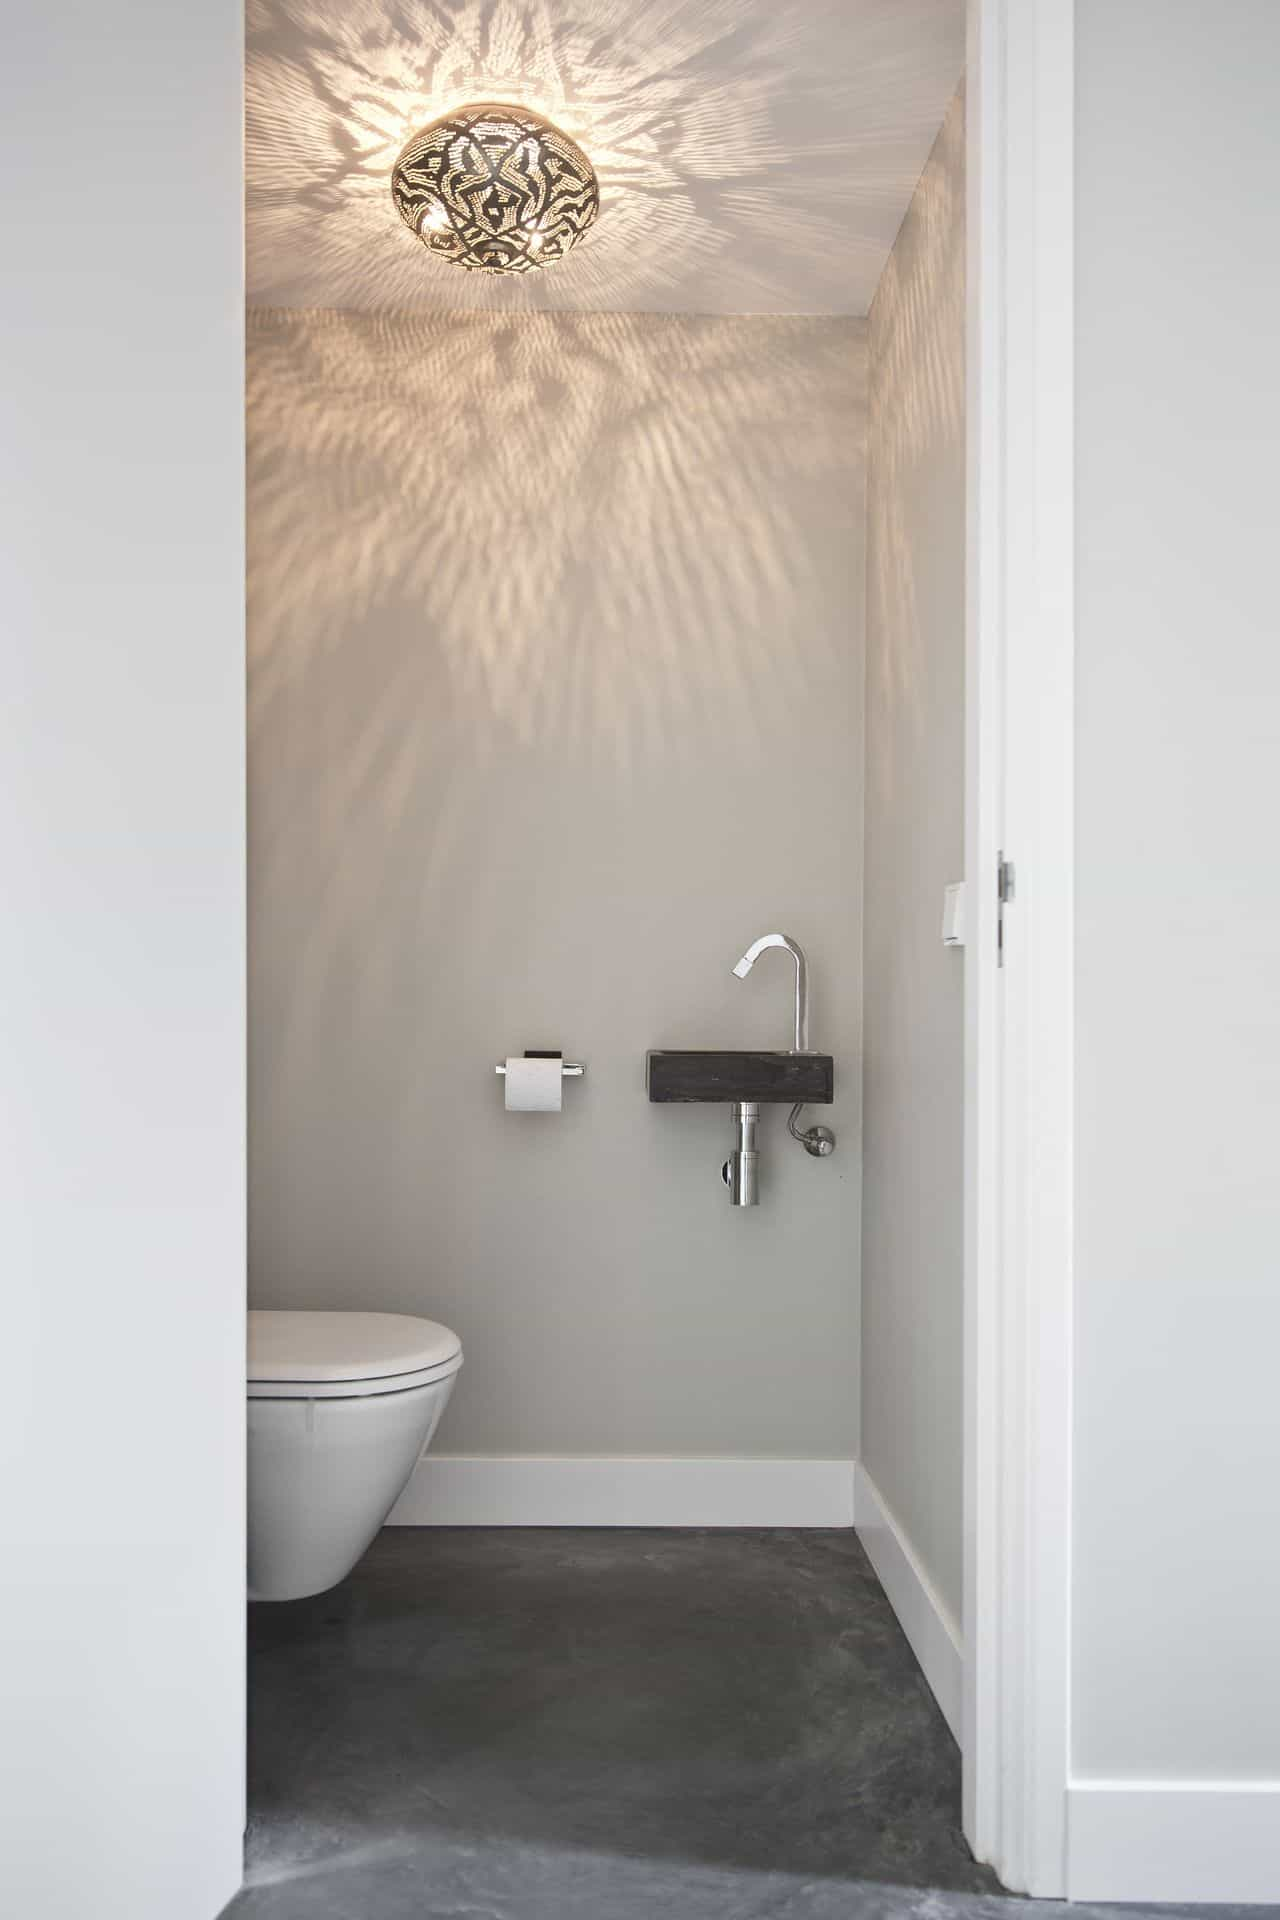 toilet met betonvloer, betonvloer in toilet, gevlinderd woonbeton in toiletgedeelte